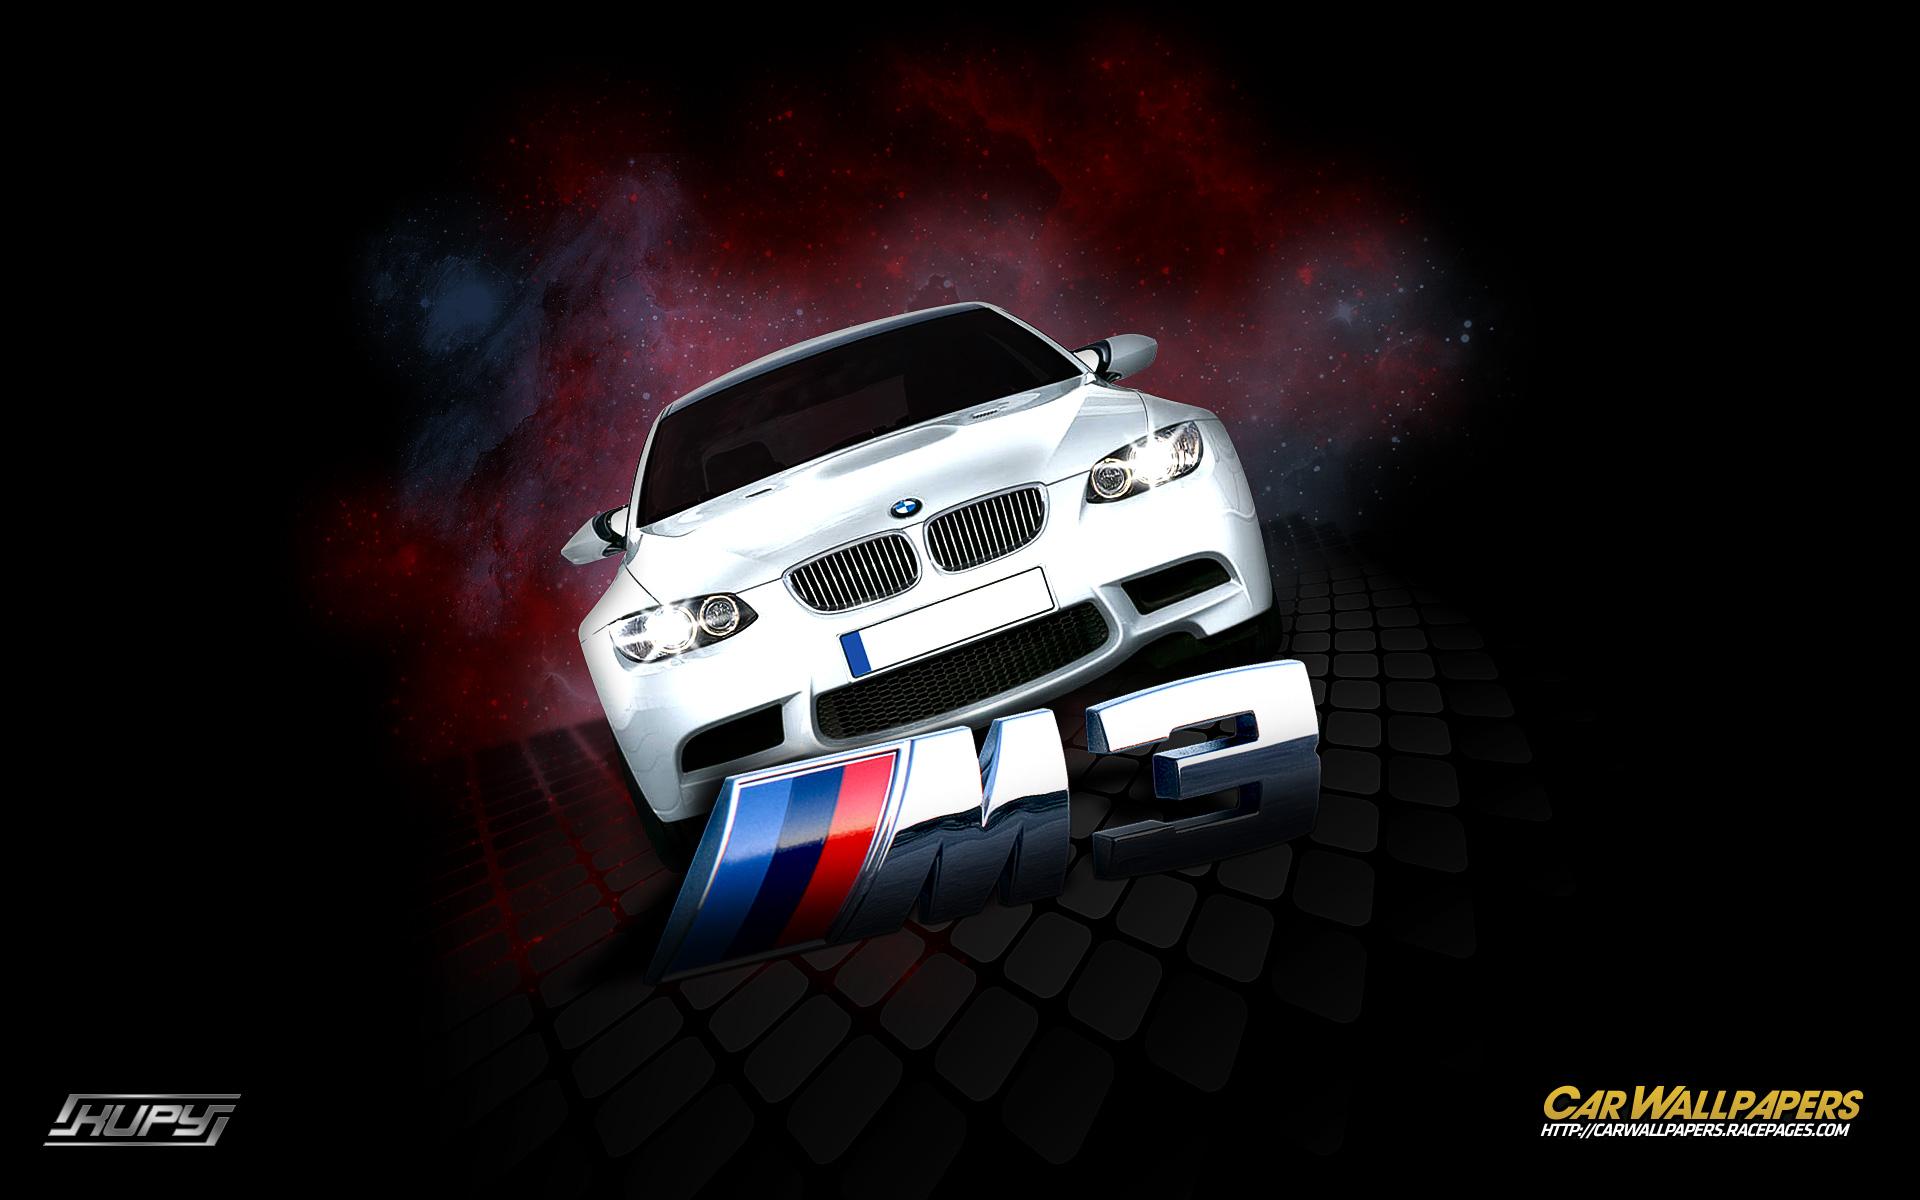 Gzel BMW Tuning hd resimleri   BMW Desktop HD Wallpapers Rooteto 1920x1200